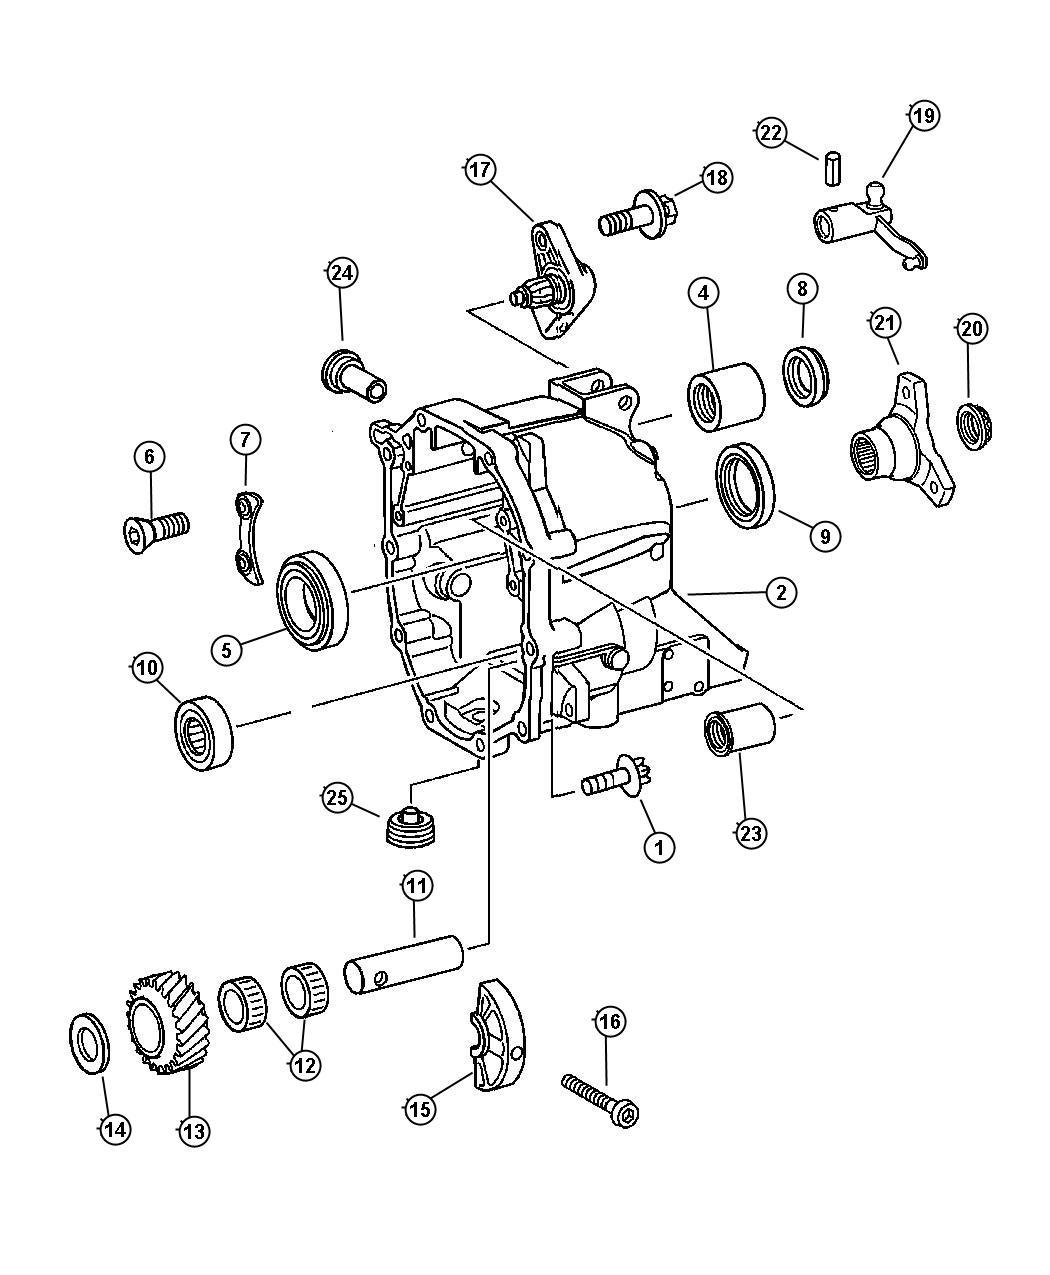 2004 Chrysler Crossfire Lever. Shift shaft. Related, rear